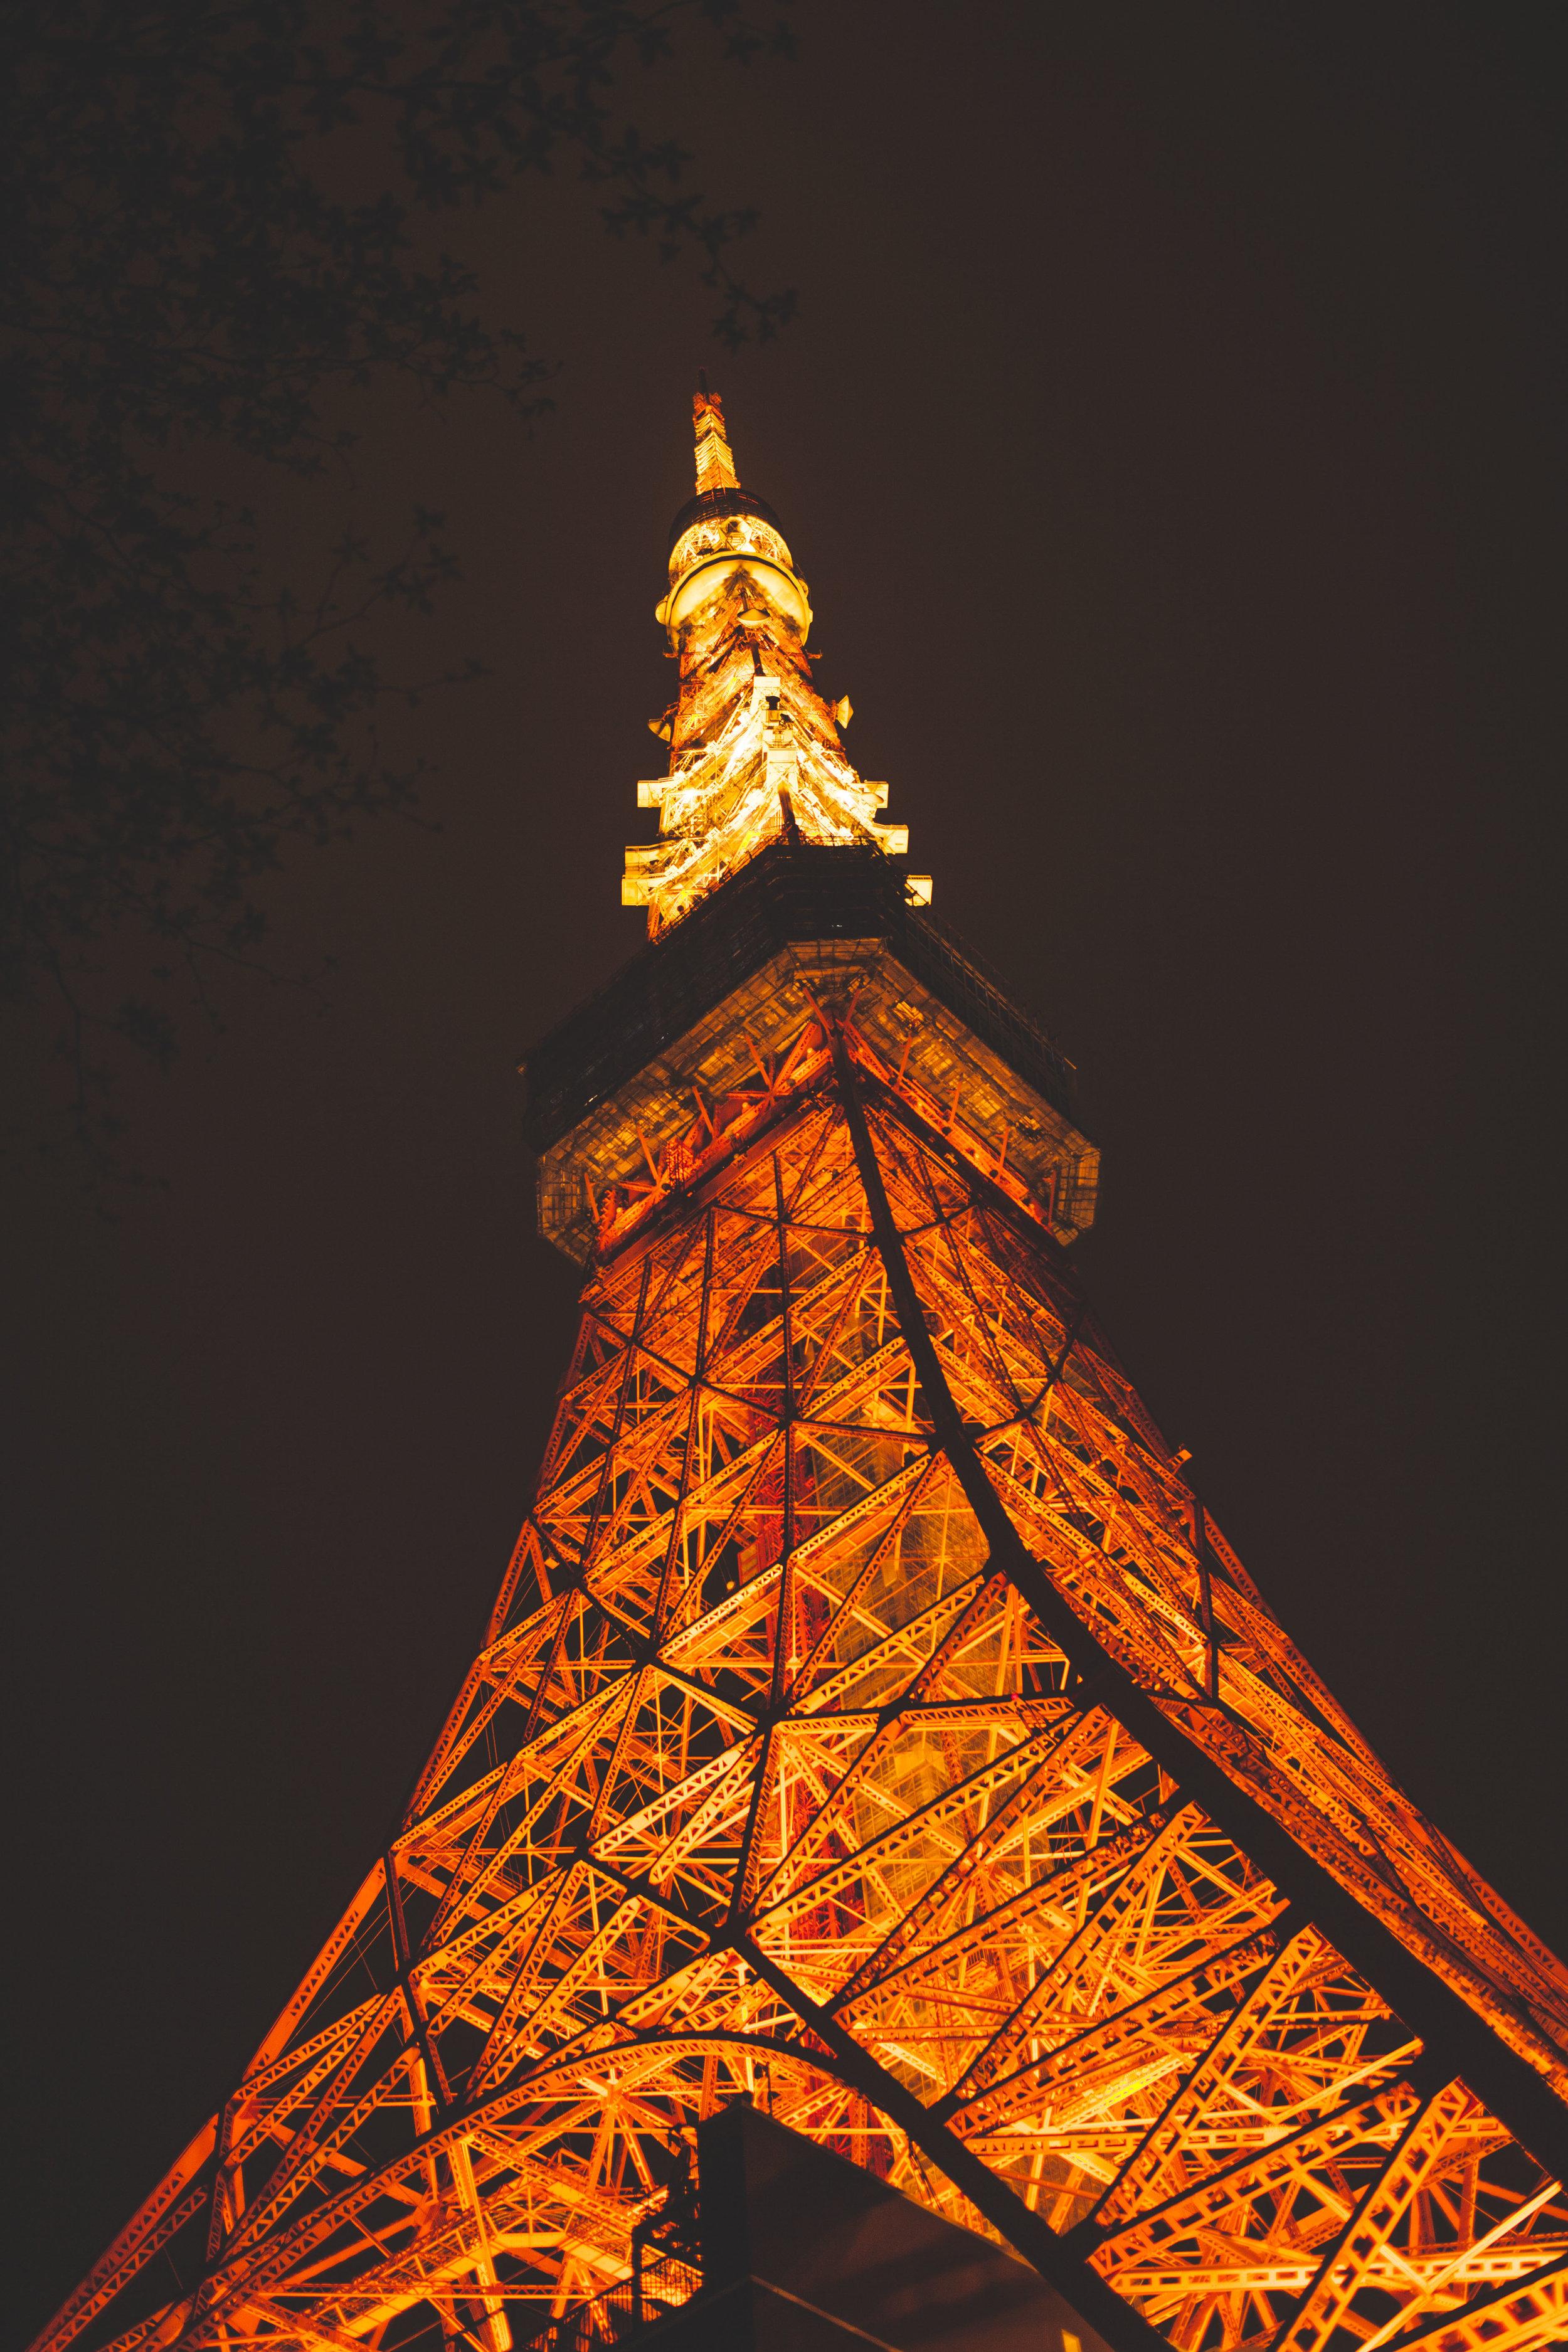 Canon 5D Mark II, 35mm f/ 1.4L, Tokyo Tower